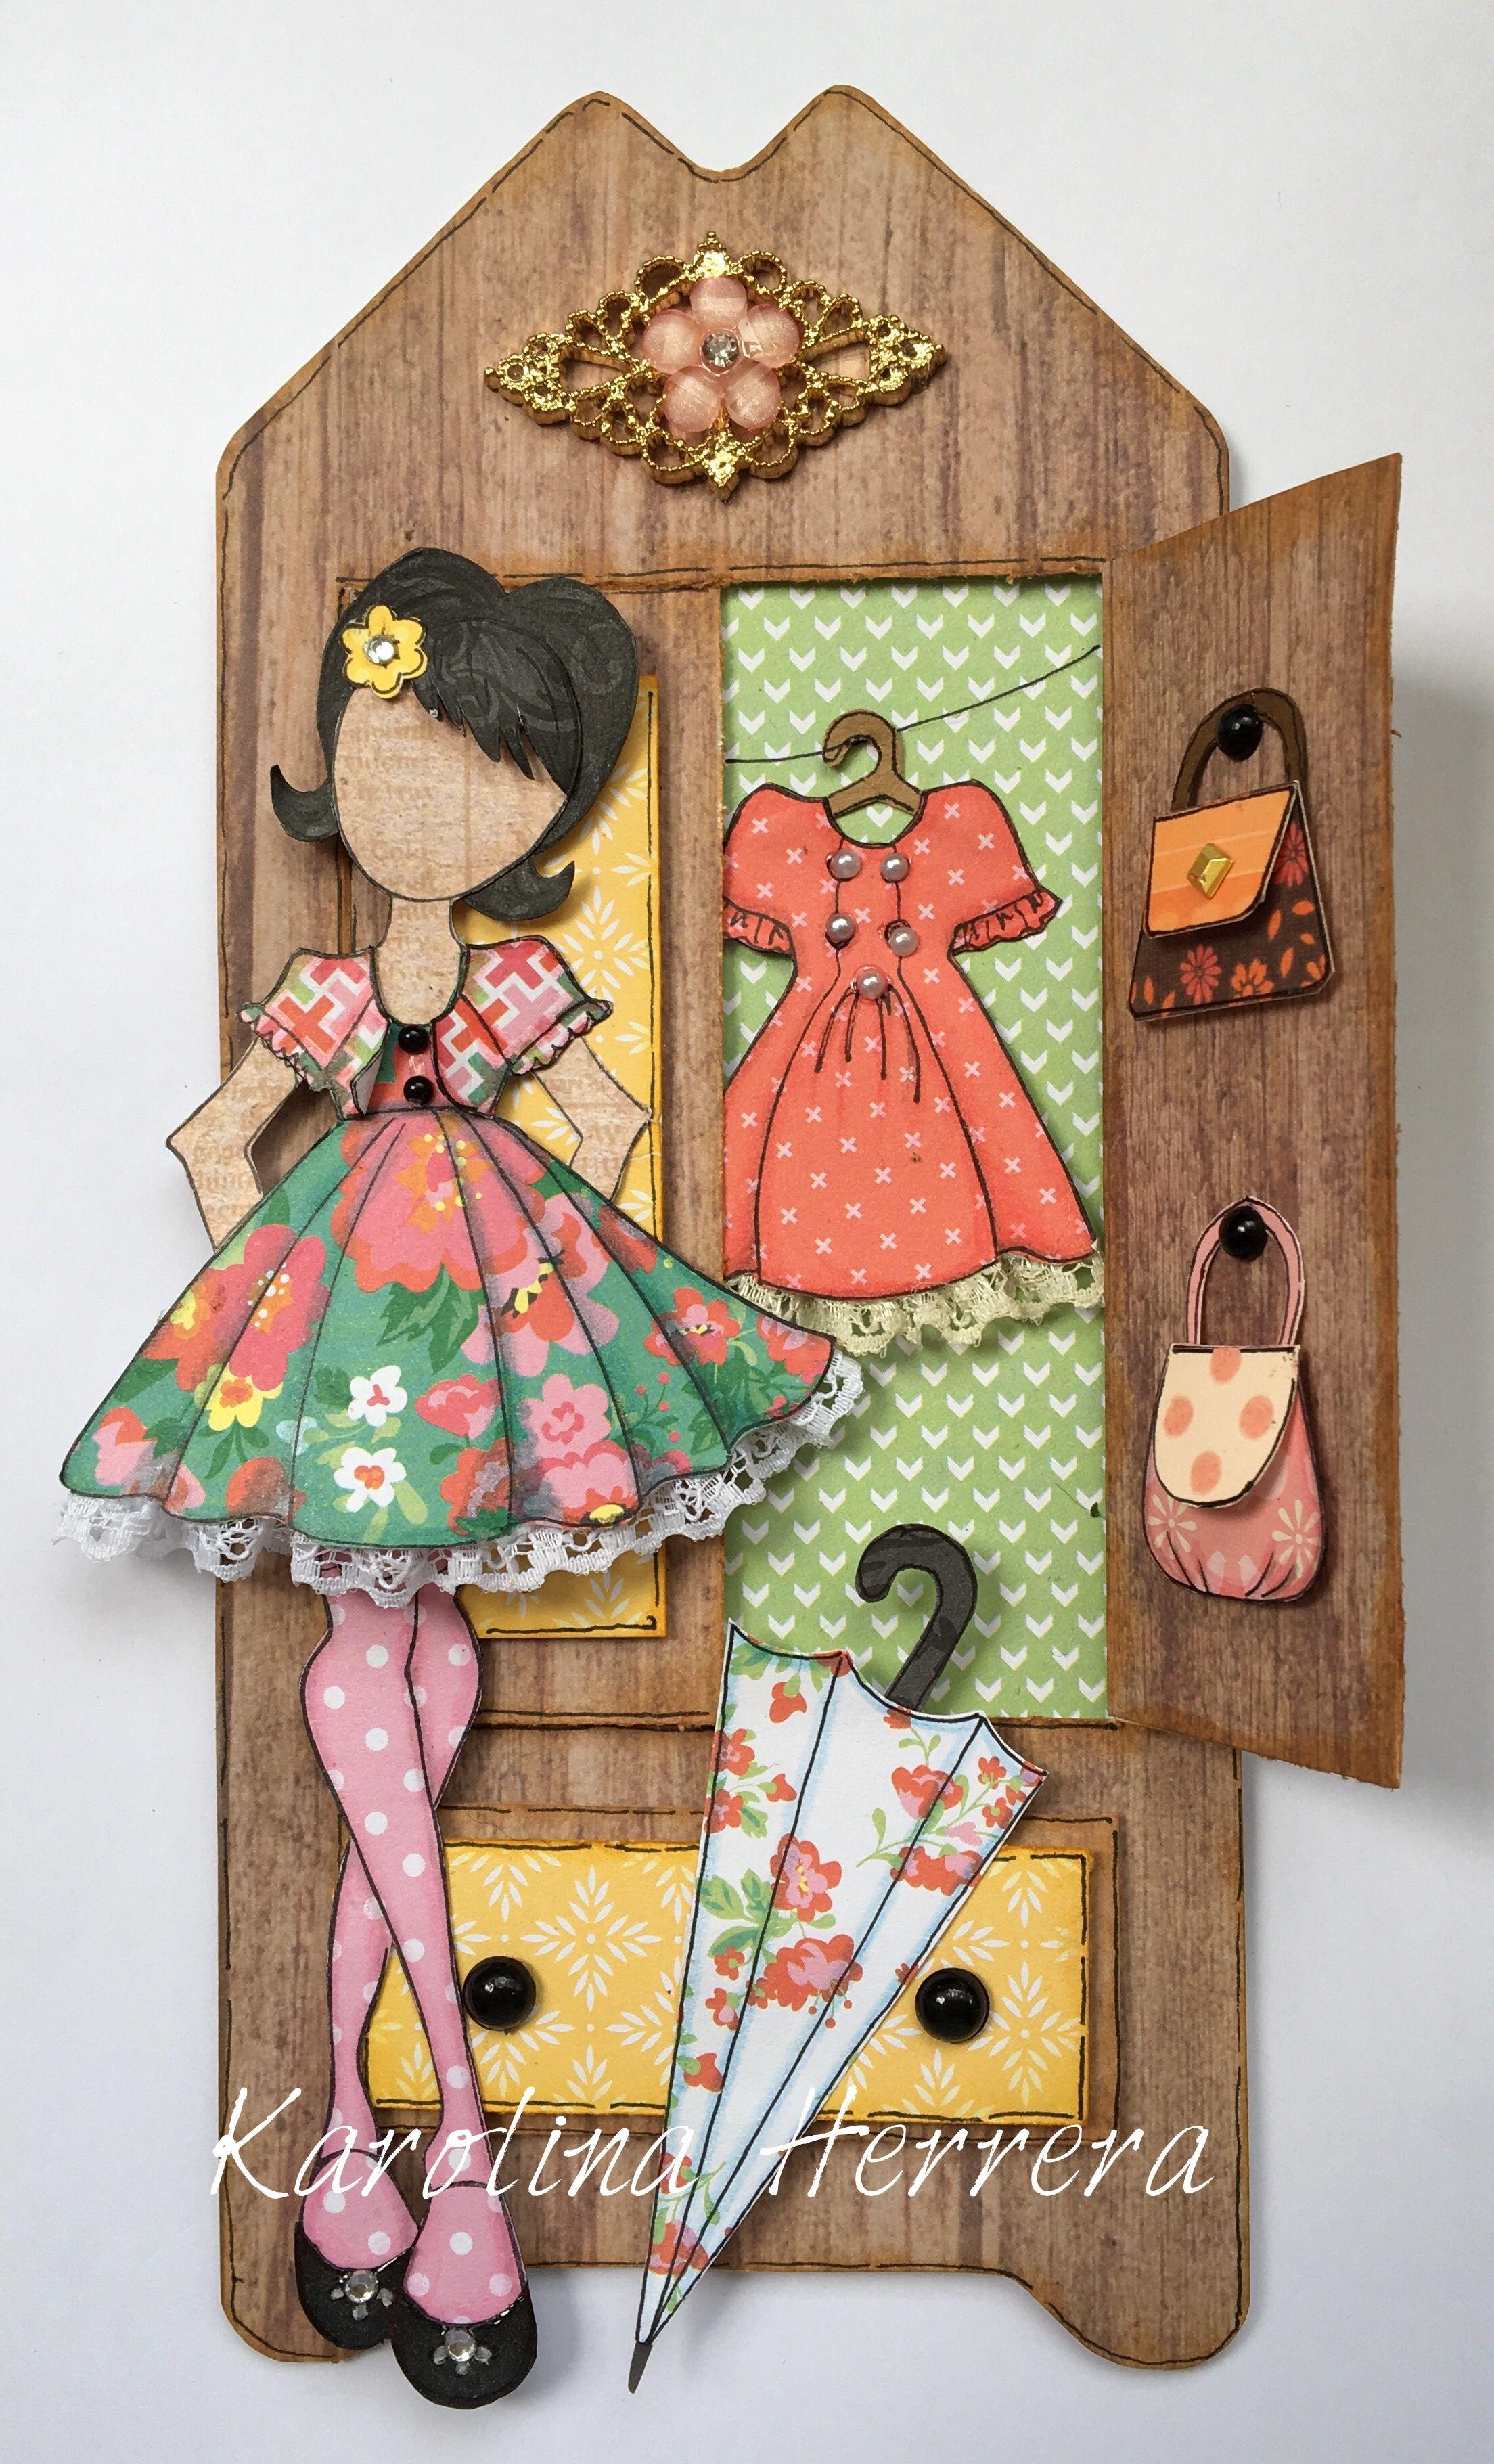 Julie Nutting, Julie Nutting doll, paper doll, Prima Dolls, mixed media doll, stamp, paper crafting, fussy cutting, flower, wardrobe, doll wardrobe, dress, doll dress, umbrella, closet